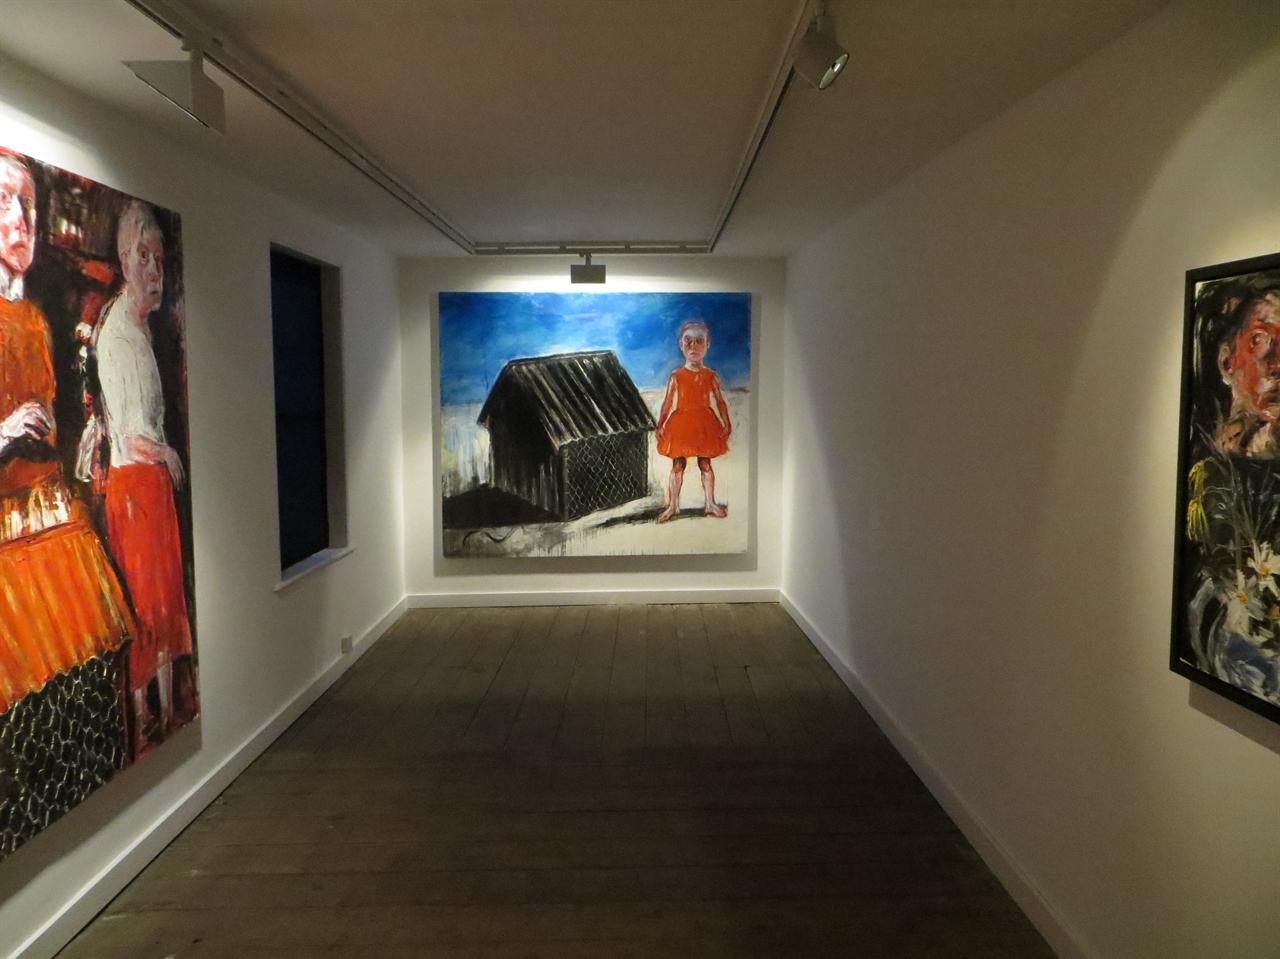 Shani_Rhys_James_Exhibition_04.jpeg